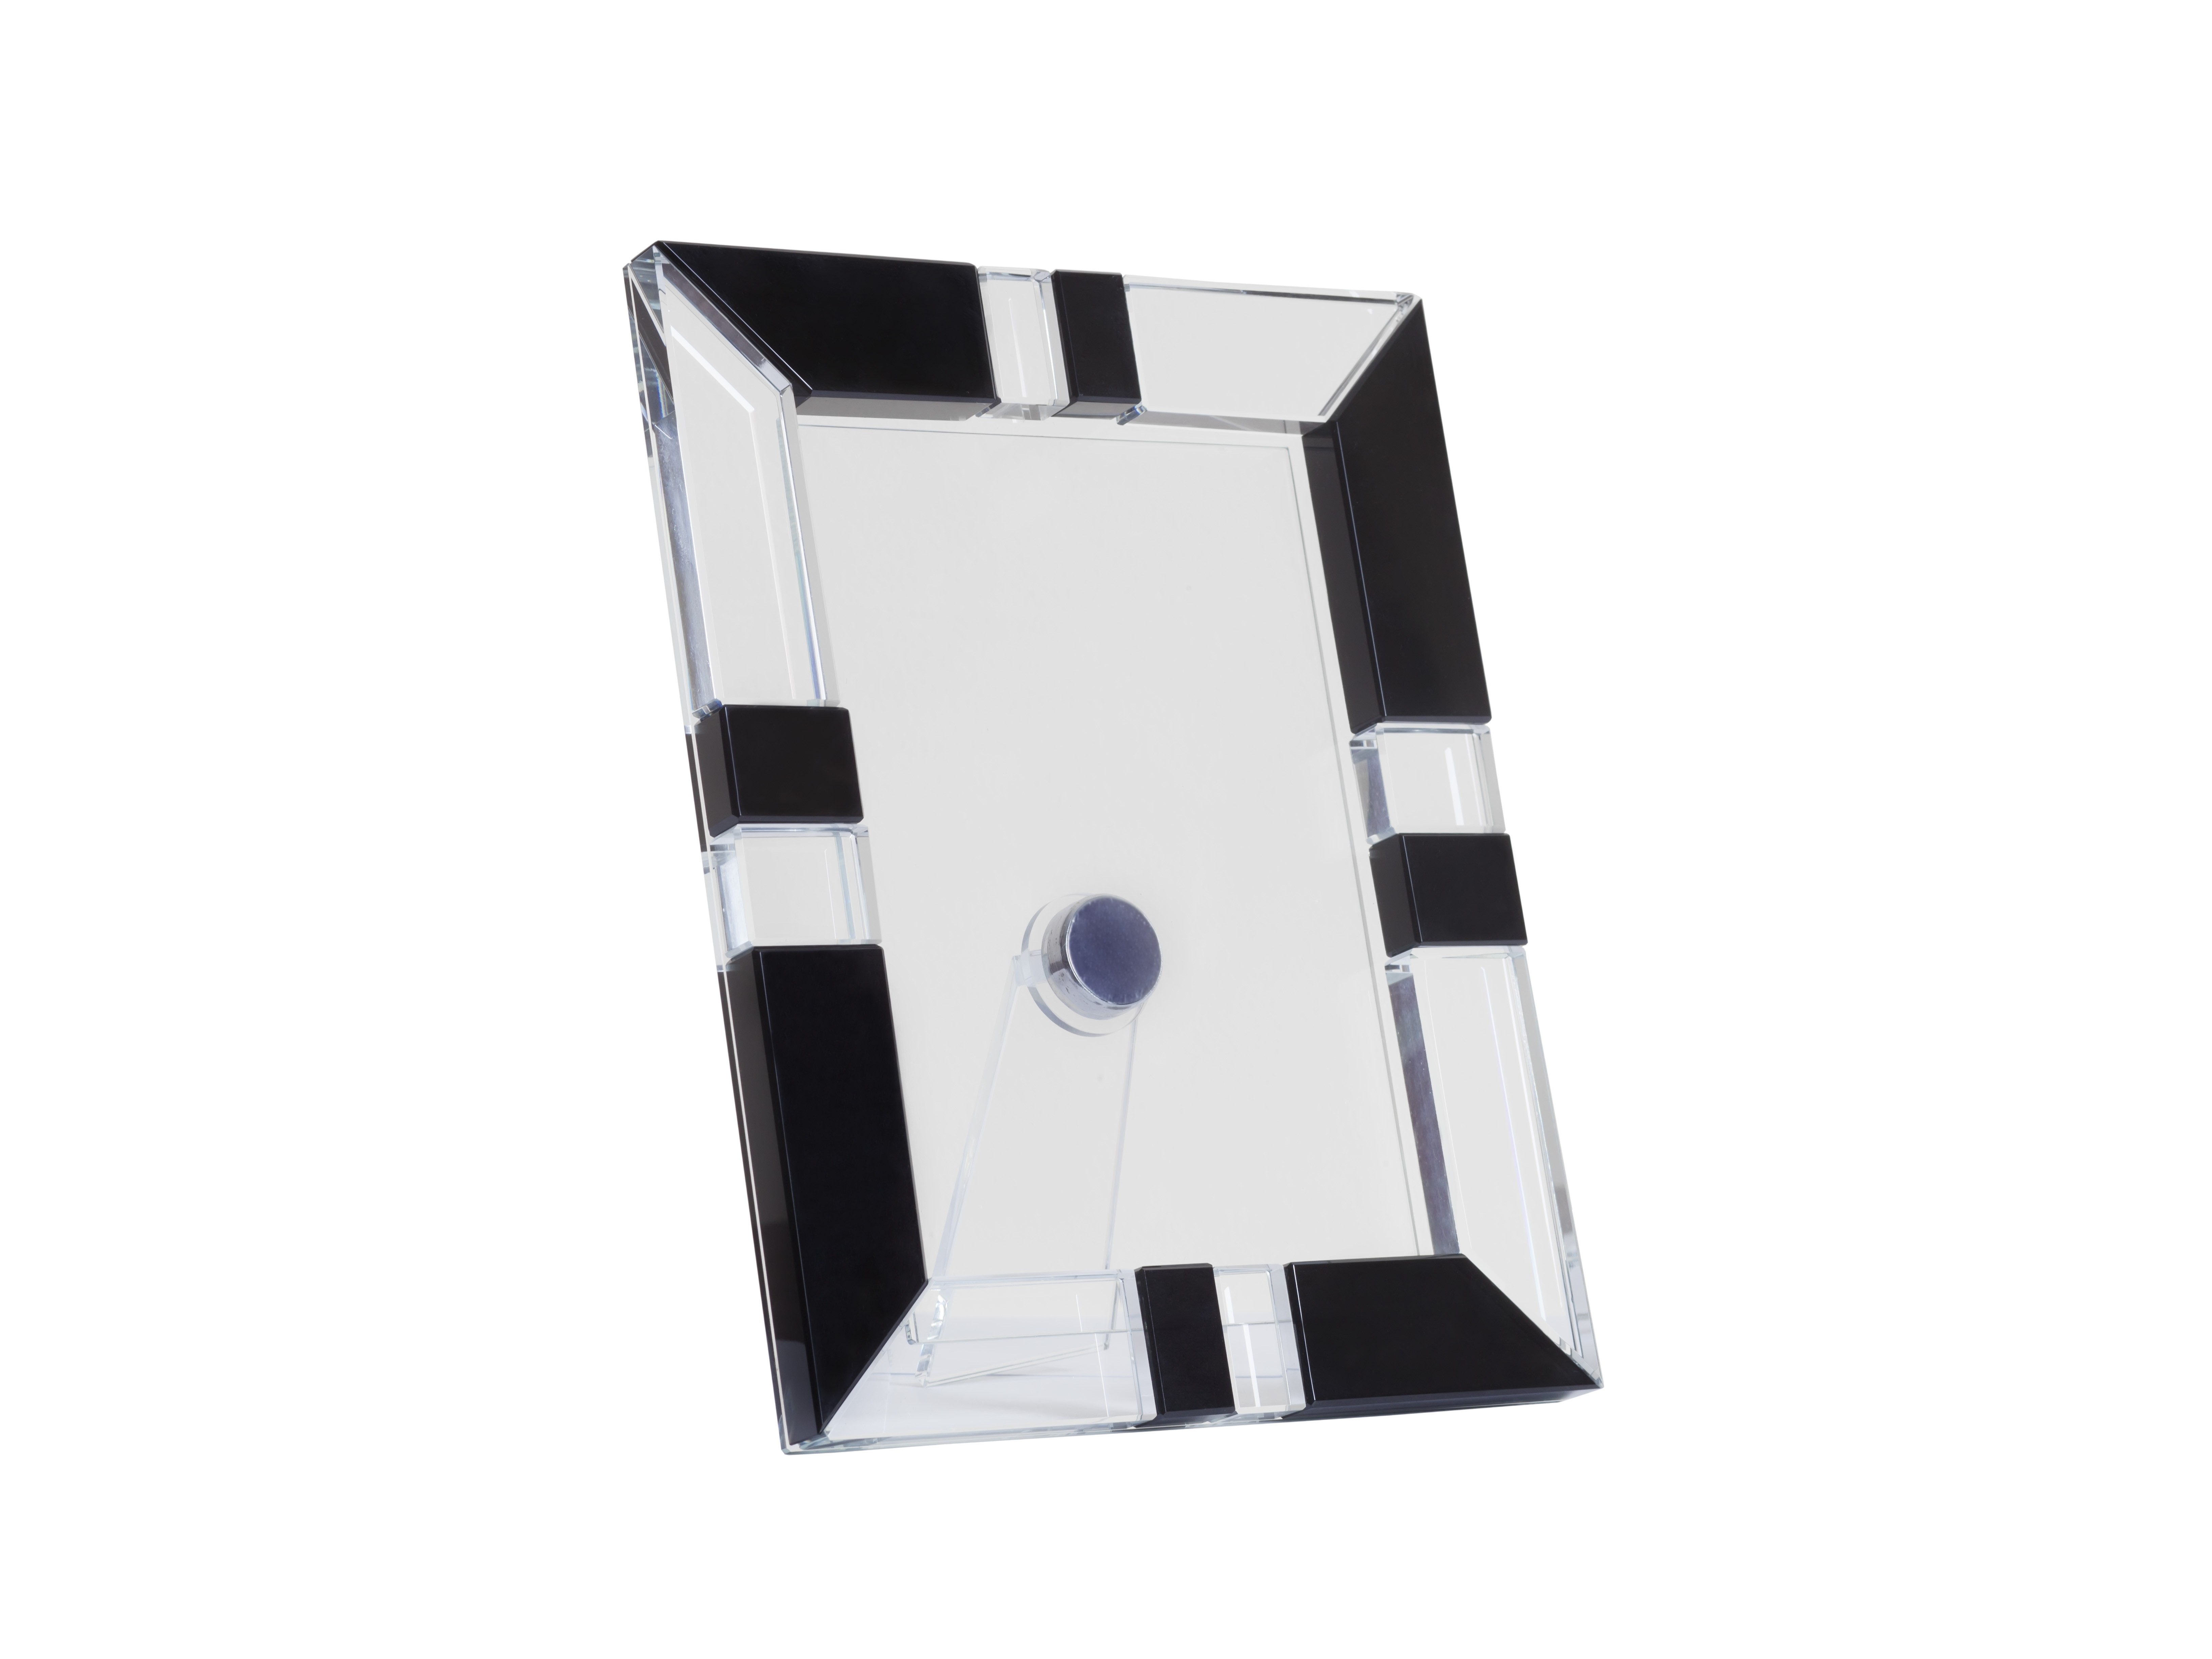 ФоторамкаРамки для фотографий<br><br><br>Material: Хрусталь<br>Ширина см: 15<br>Высота см: 20<br>Глубина см: 10